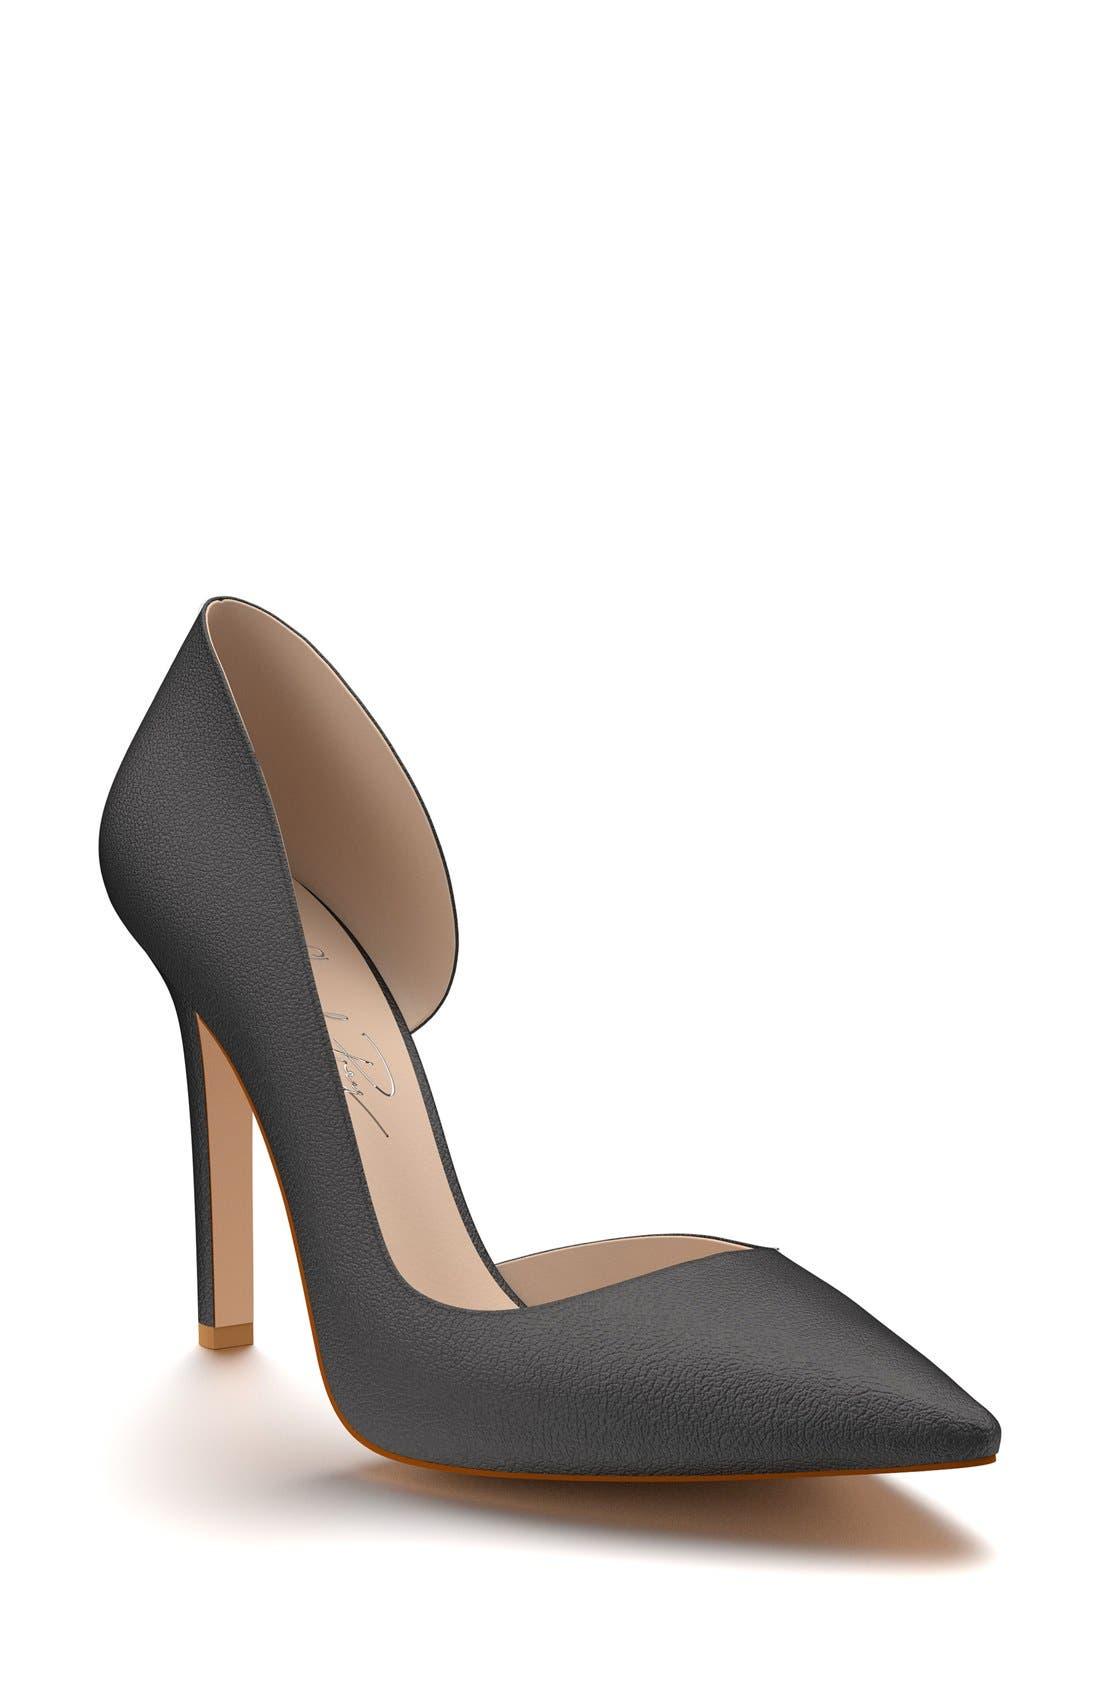 Main Image - Shoes of Prey Half d'Orsay Pump (Women)